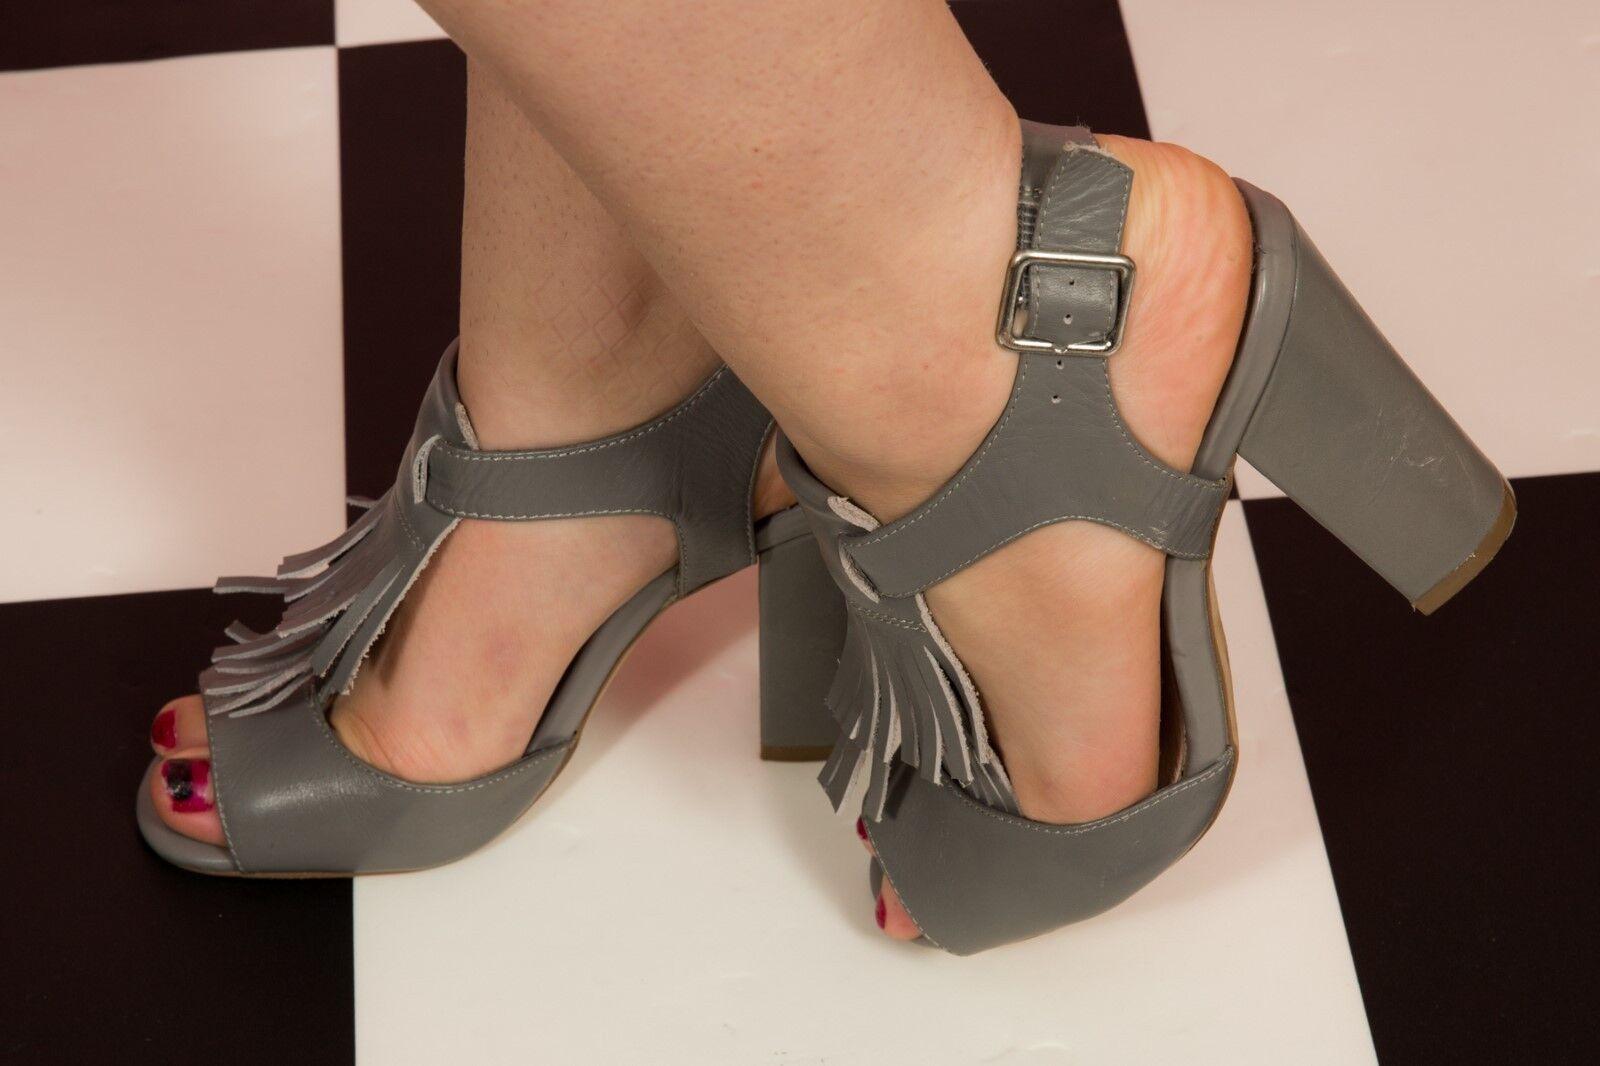 Grey tasseled fringed t-bar peeptoe heels NEXT size 6